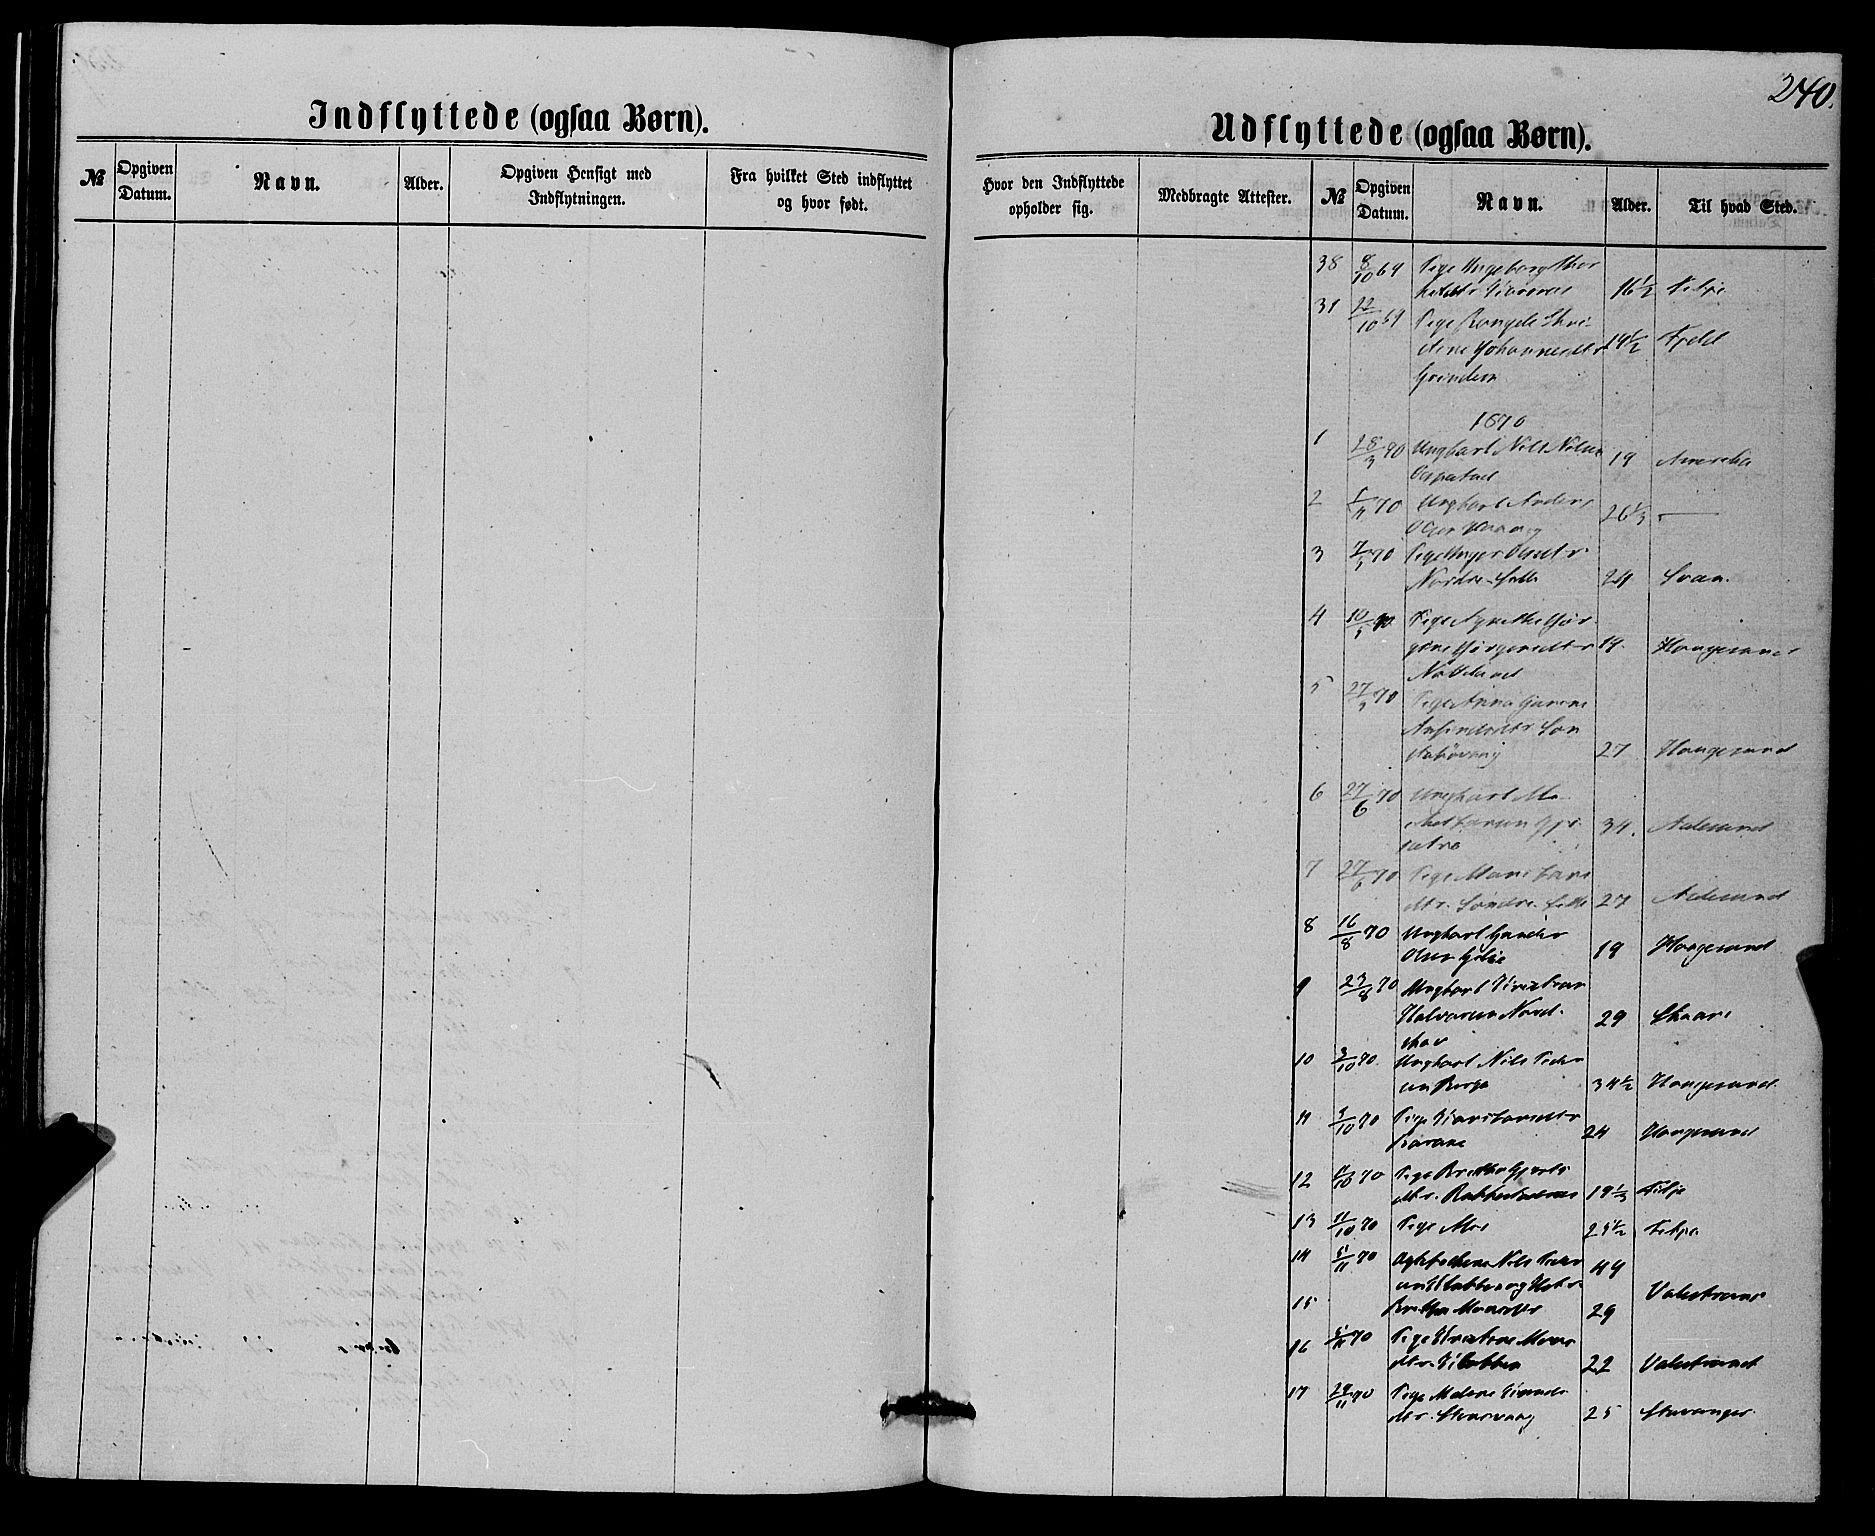 SAB, Finnås sokneprestembete, H/Ha/Haa/Haaa/L0008: Ministerialbok nr. A 8, 1863-1872, s. 240